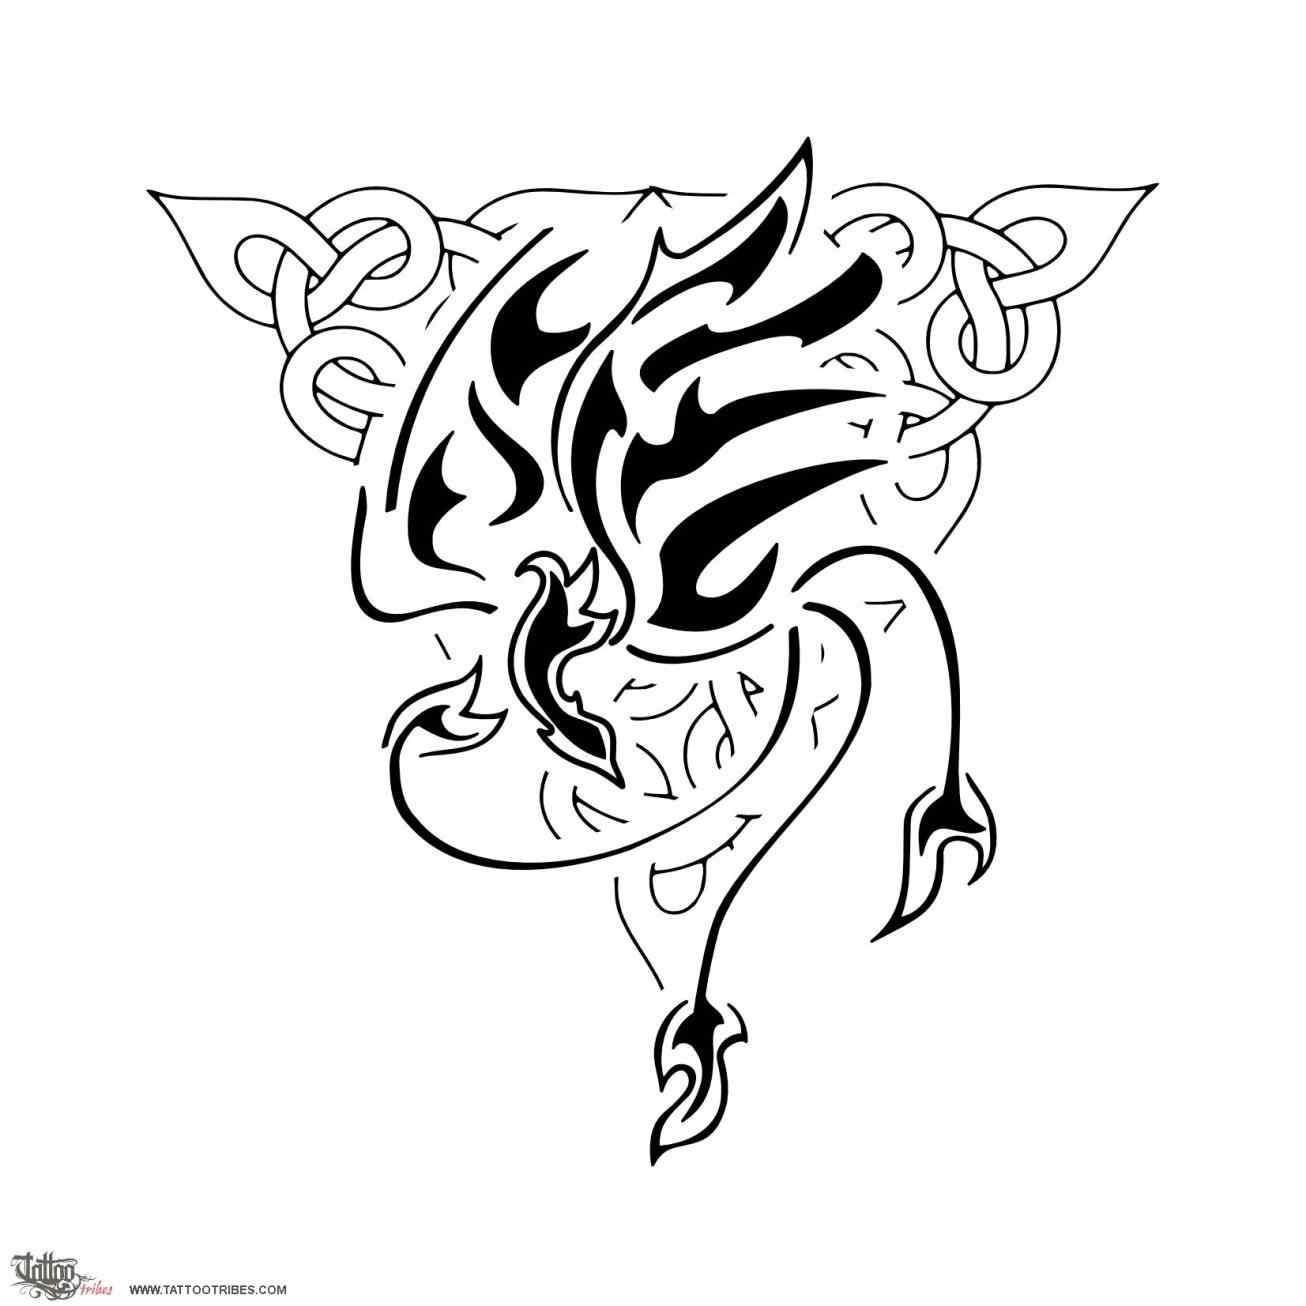 1306x1306 Claddagh Ring Tattoo Drawings